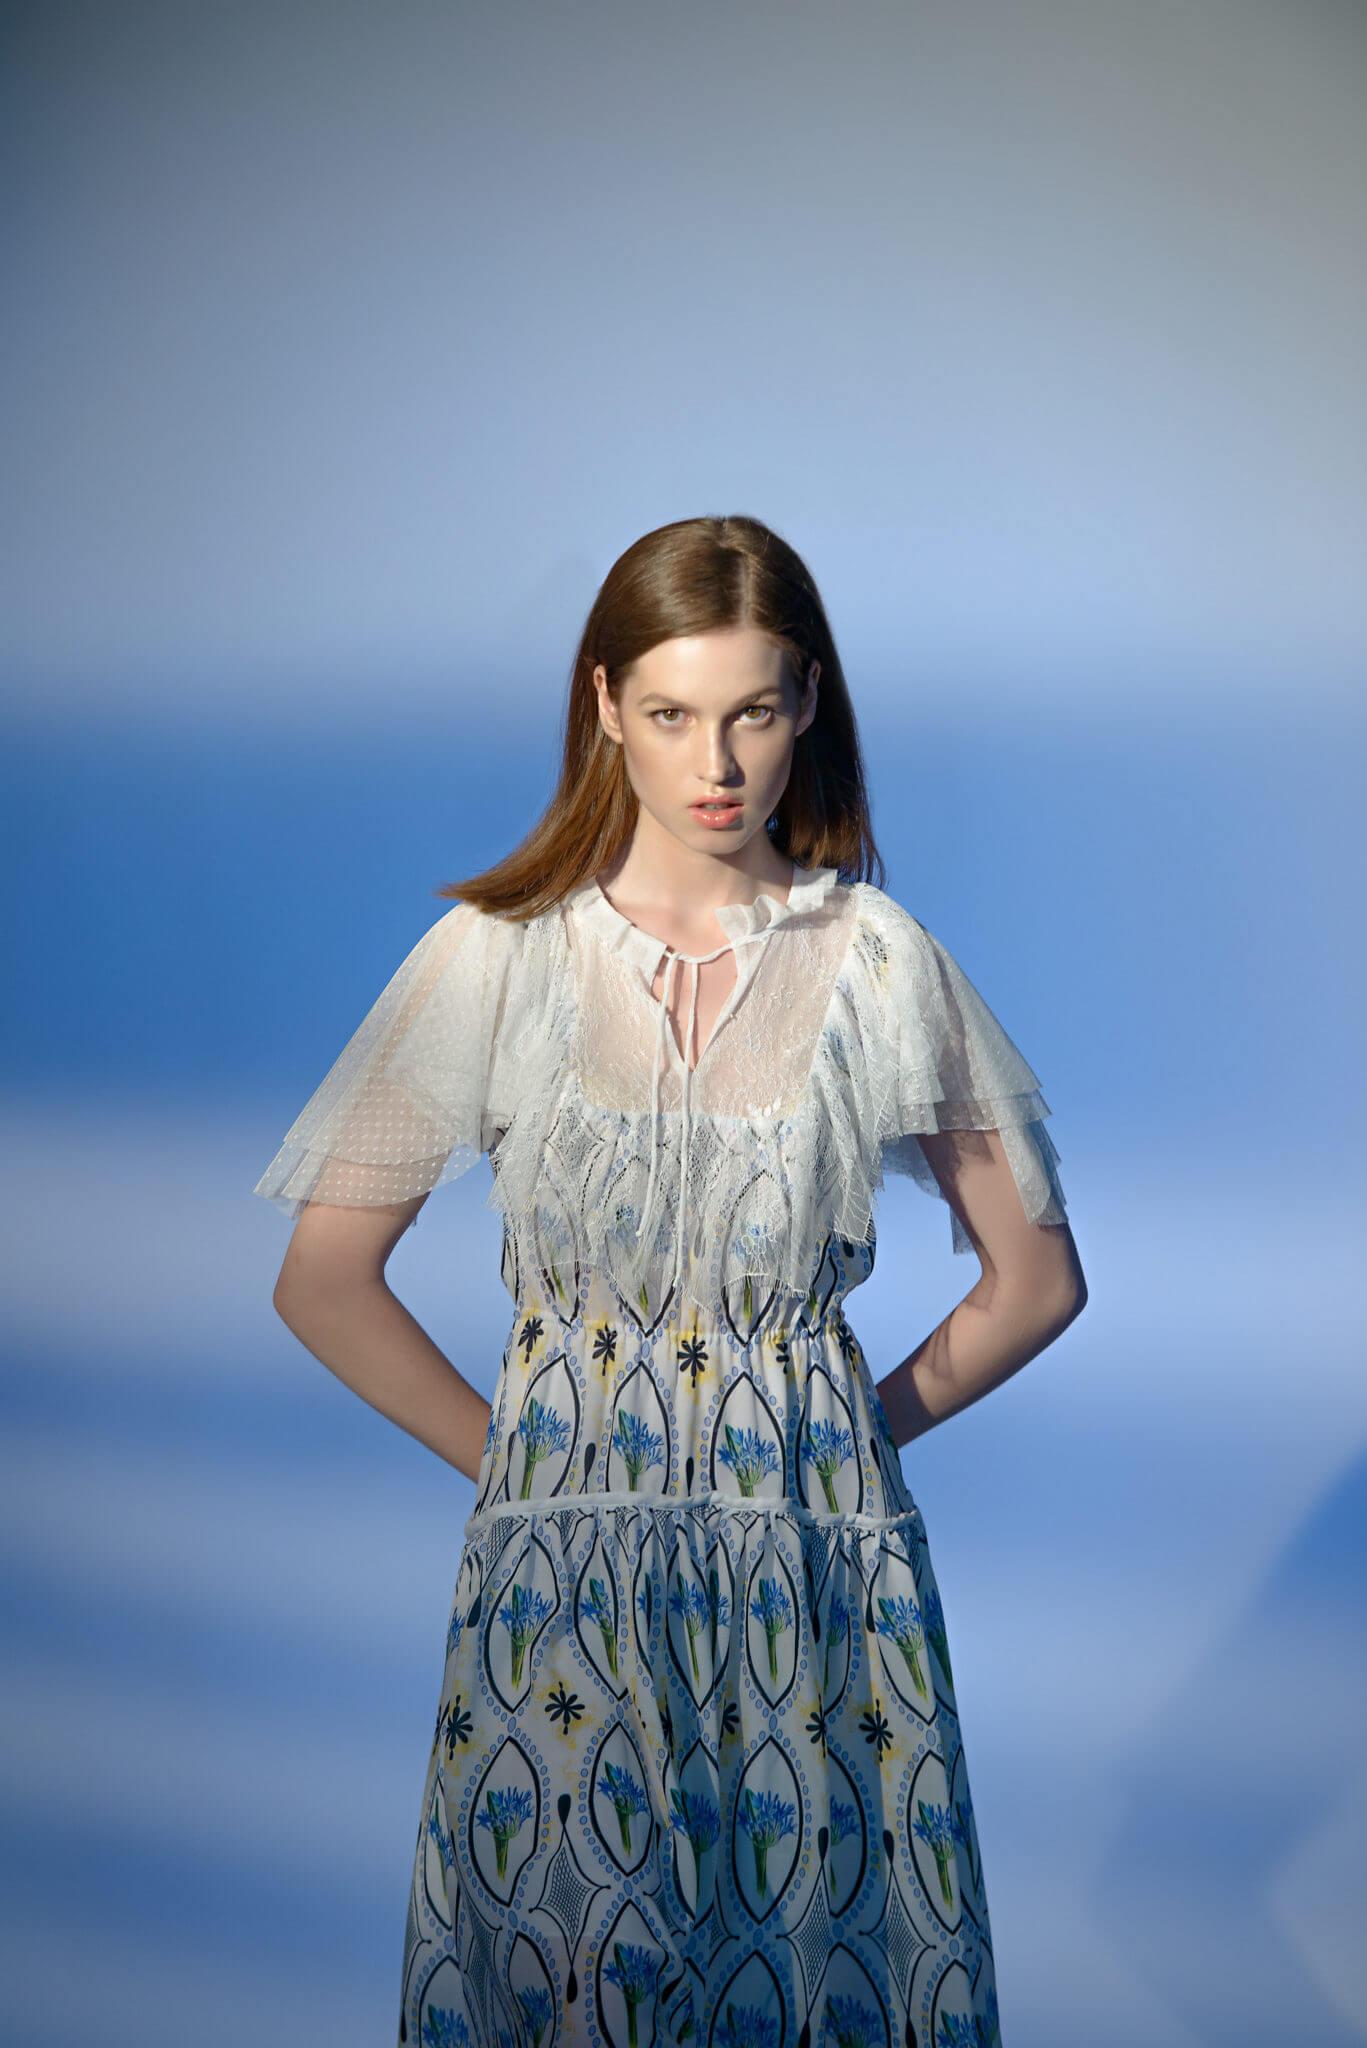 Рекламная съемка для бренда Darja Donezz. Ph Постникова, md Нана Речко. Девушка в голубом платье на синем фоне